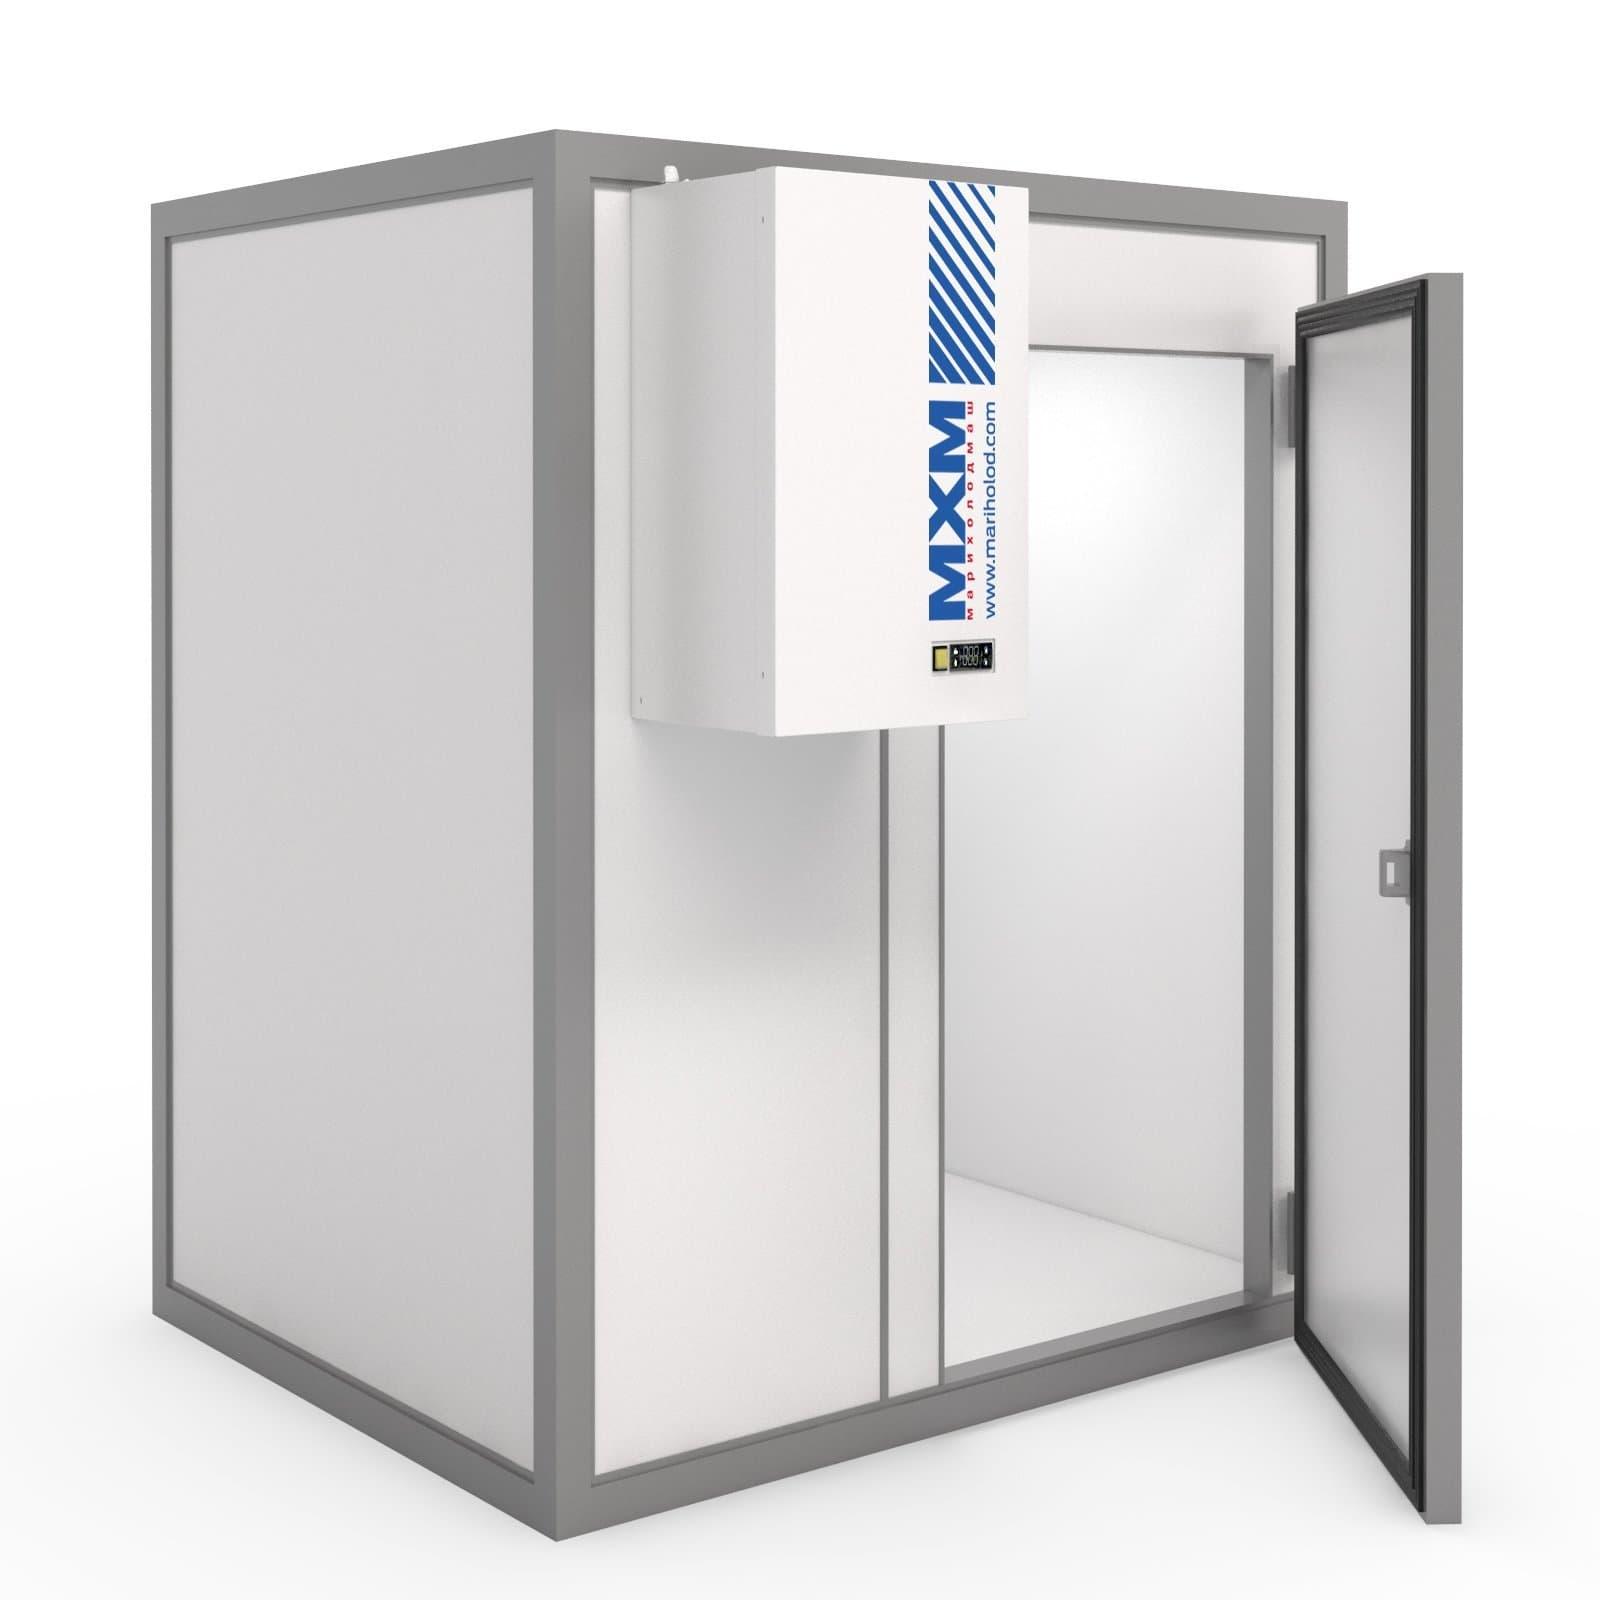 Камера холодильная МХМ КХН-27,65 1660×7360×2720